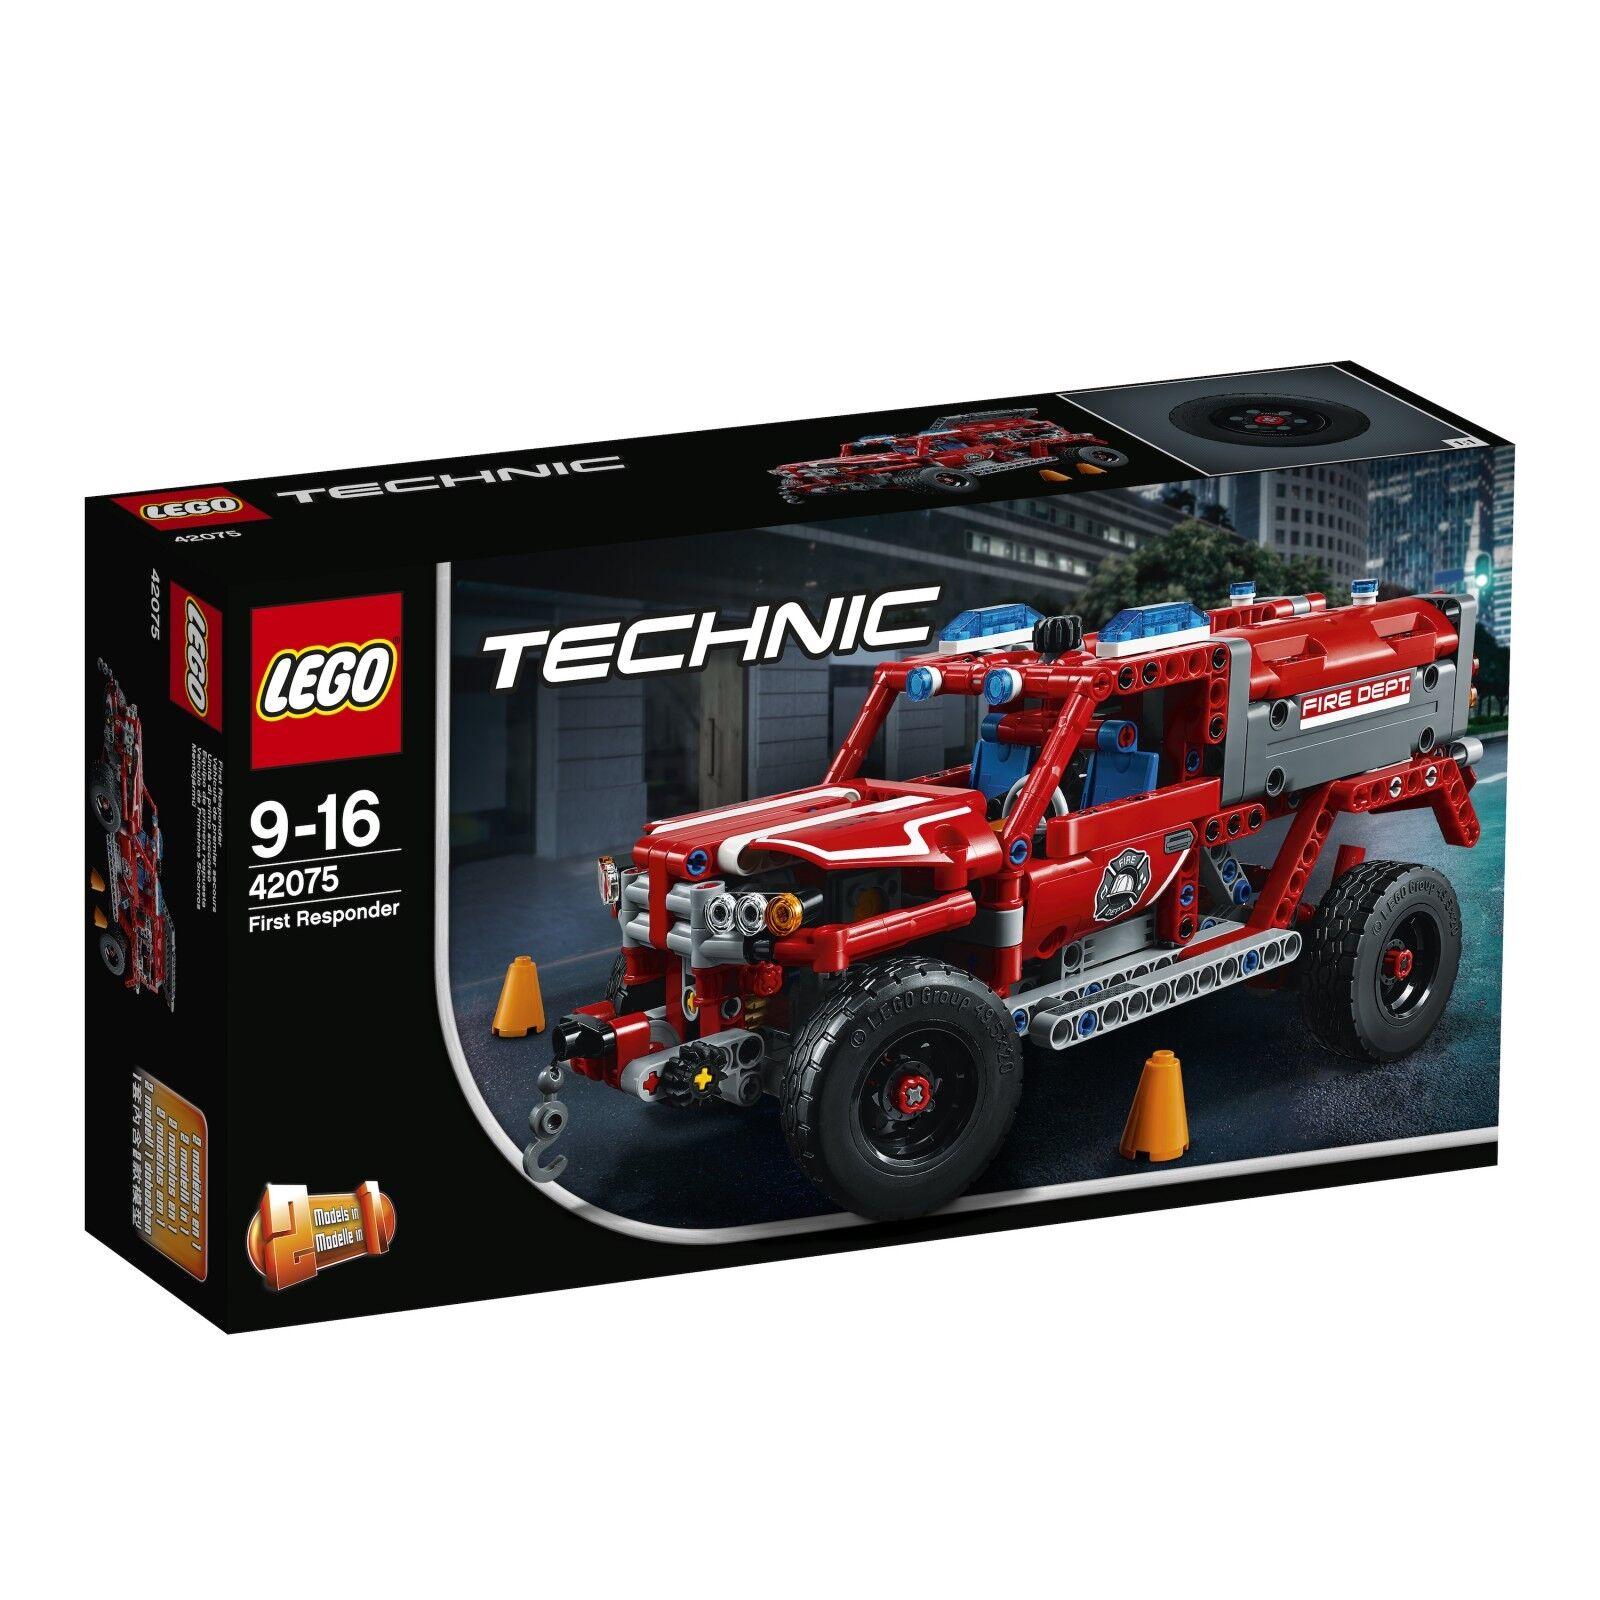 LEGO® Technic 42075 First Responder NEU OVP NEW MISB NRFB